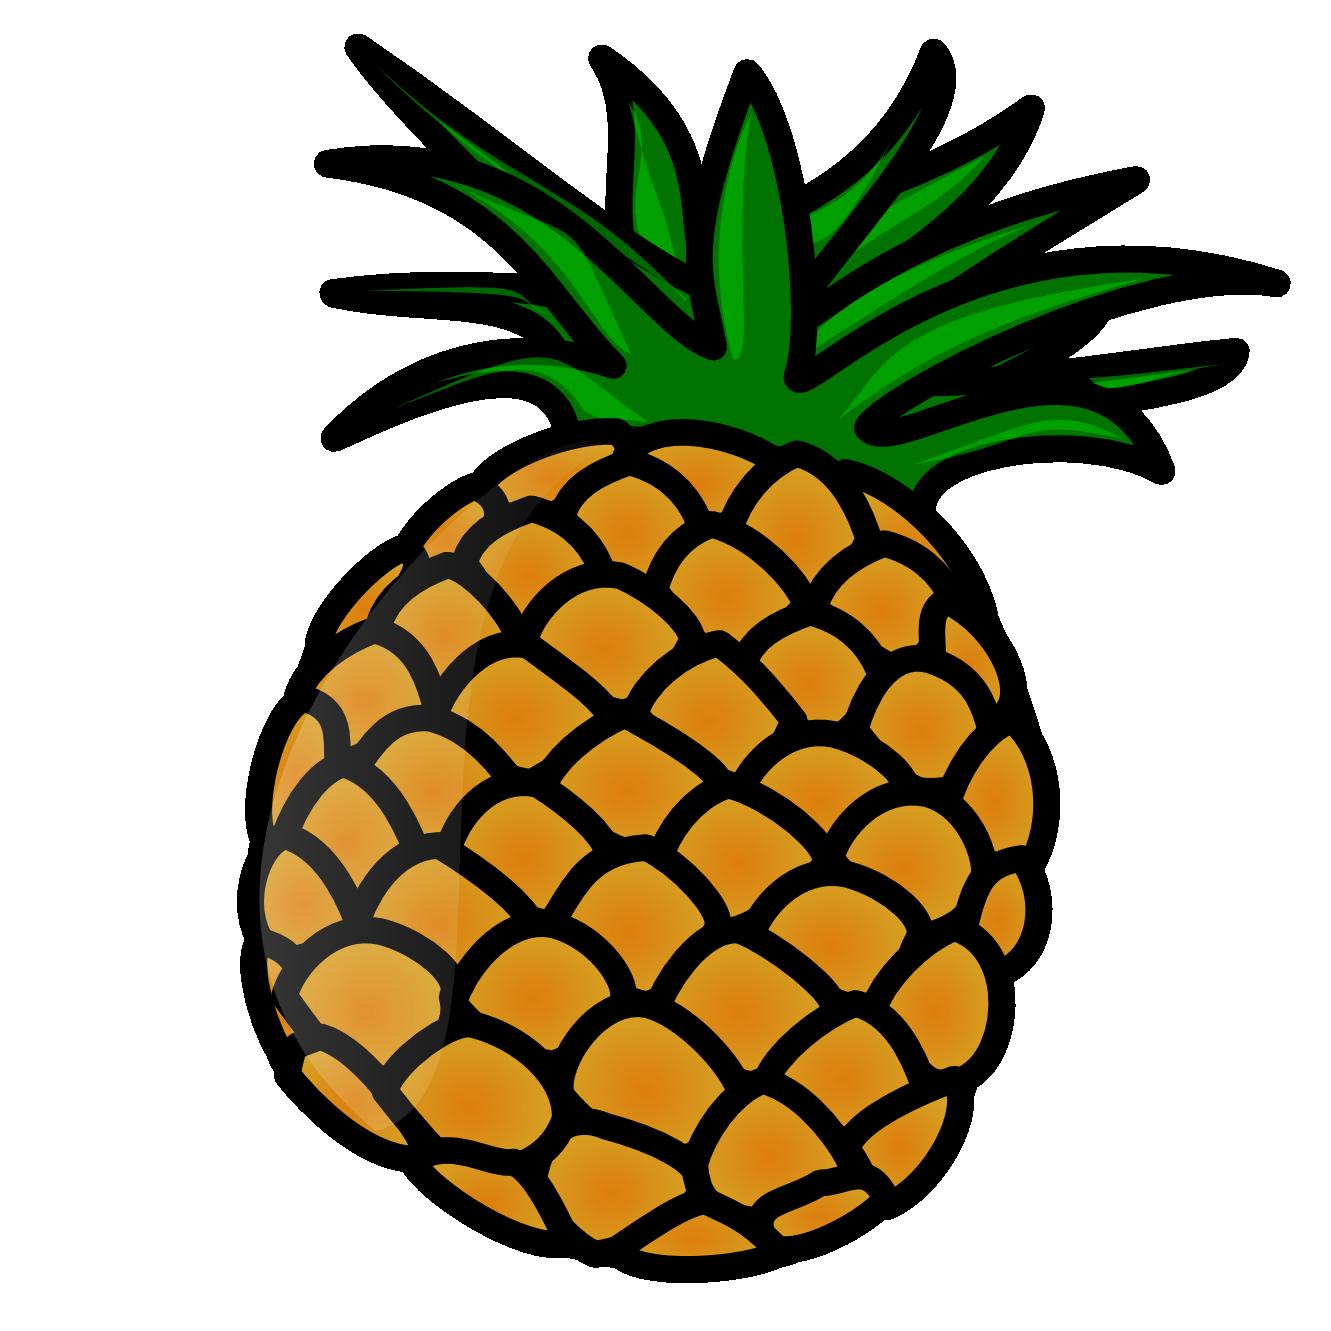 Clip art free panda. Pineapple clipart